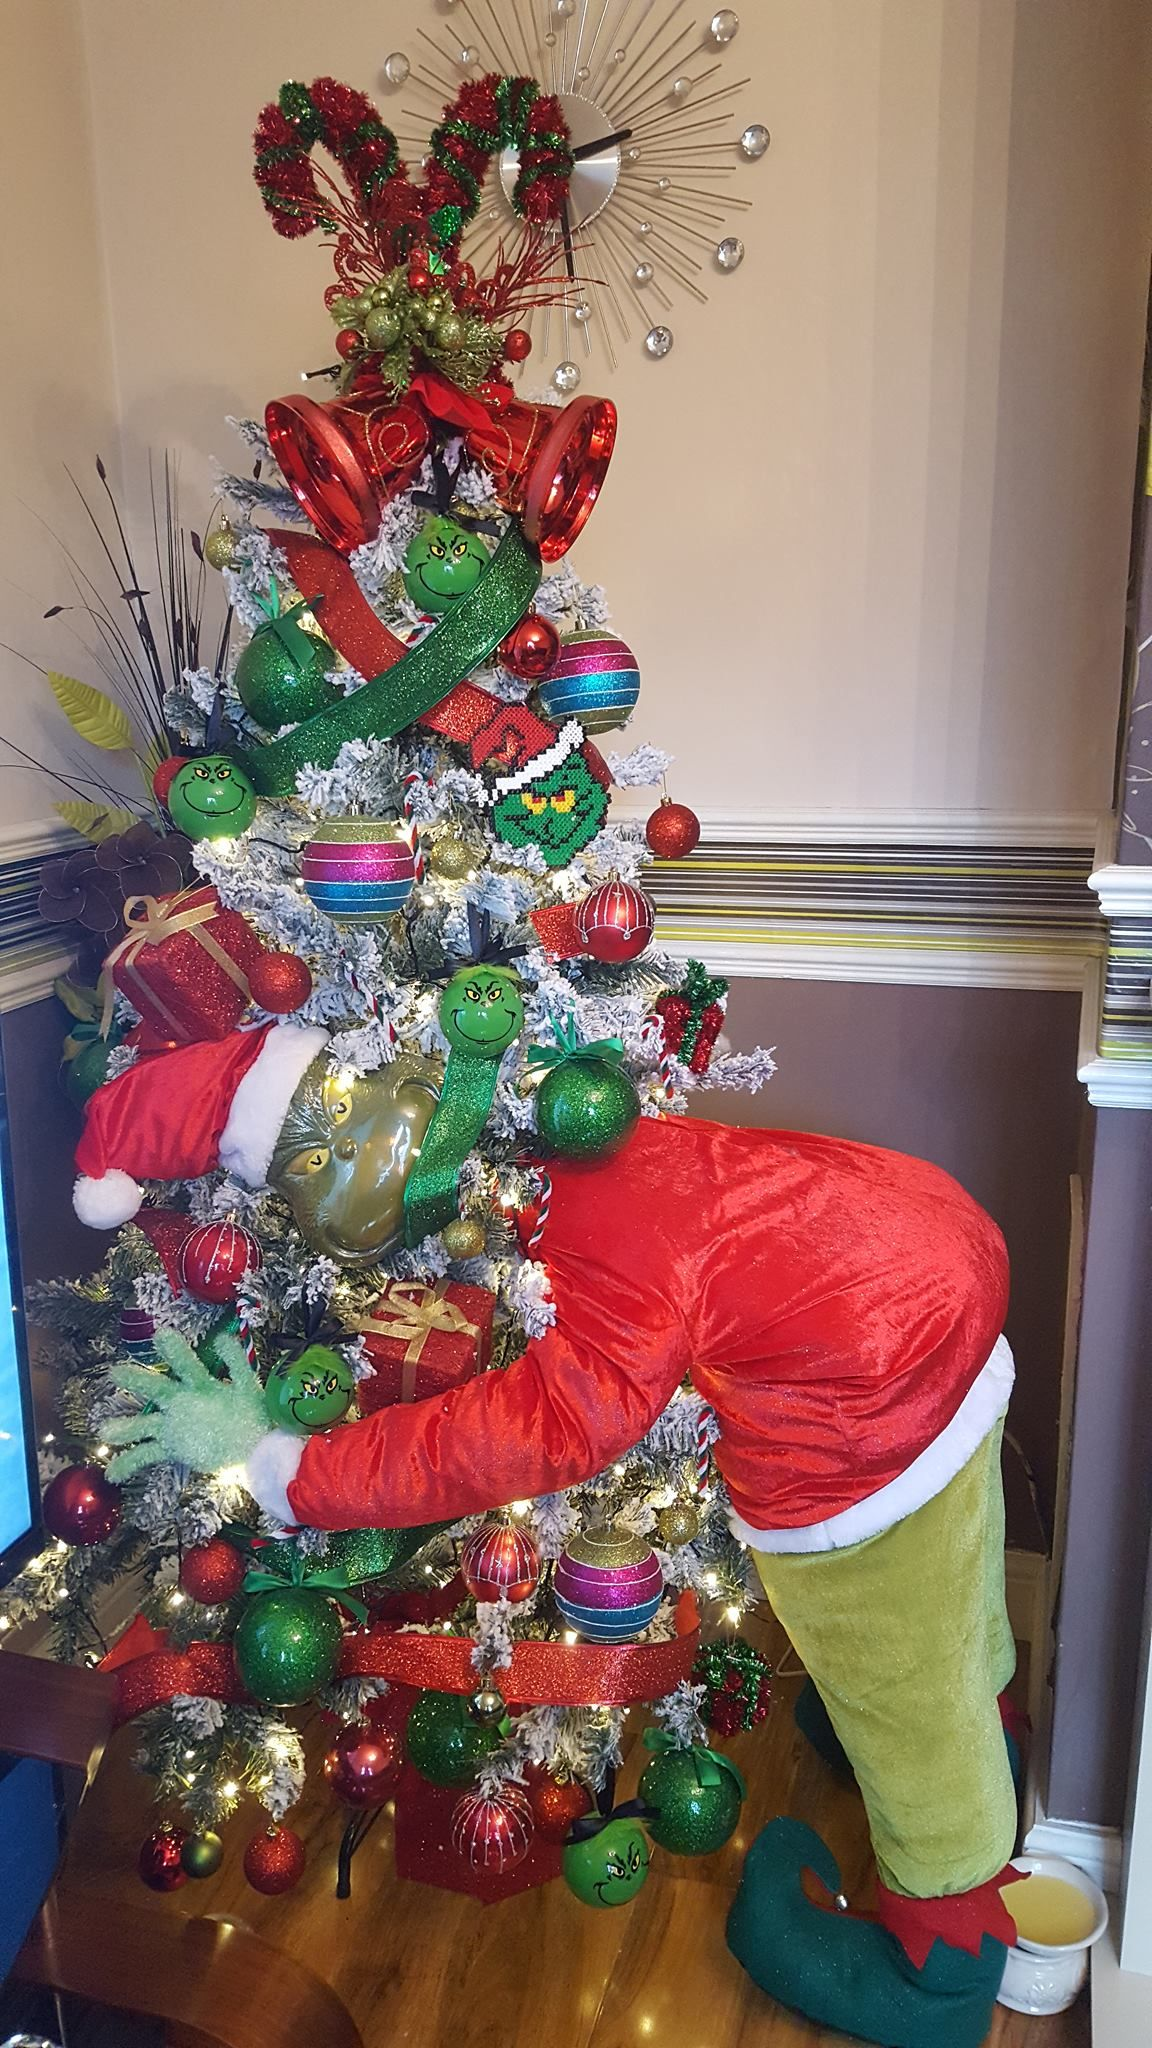 The Grinch Christmas Tree Cool Christmas Trees Grinch Christmas Tree Unique Christmas Trees